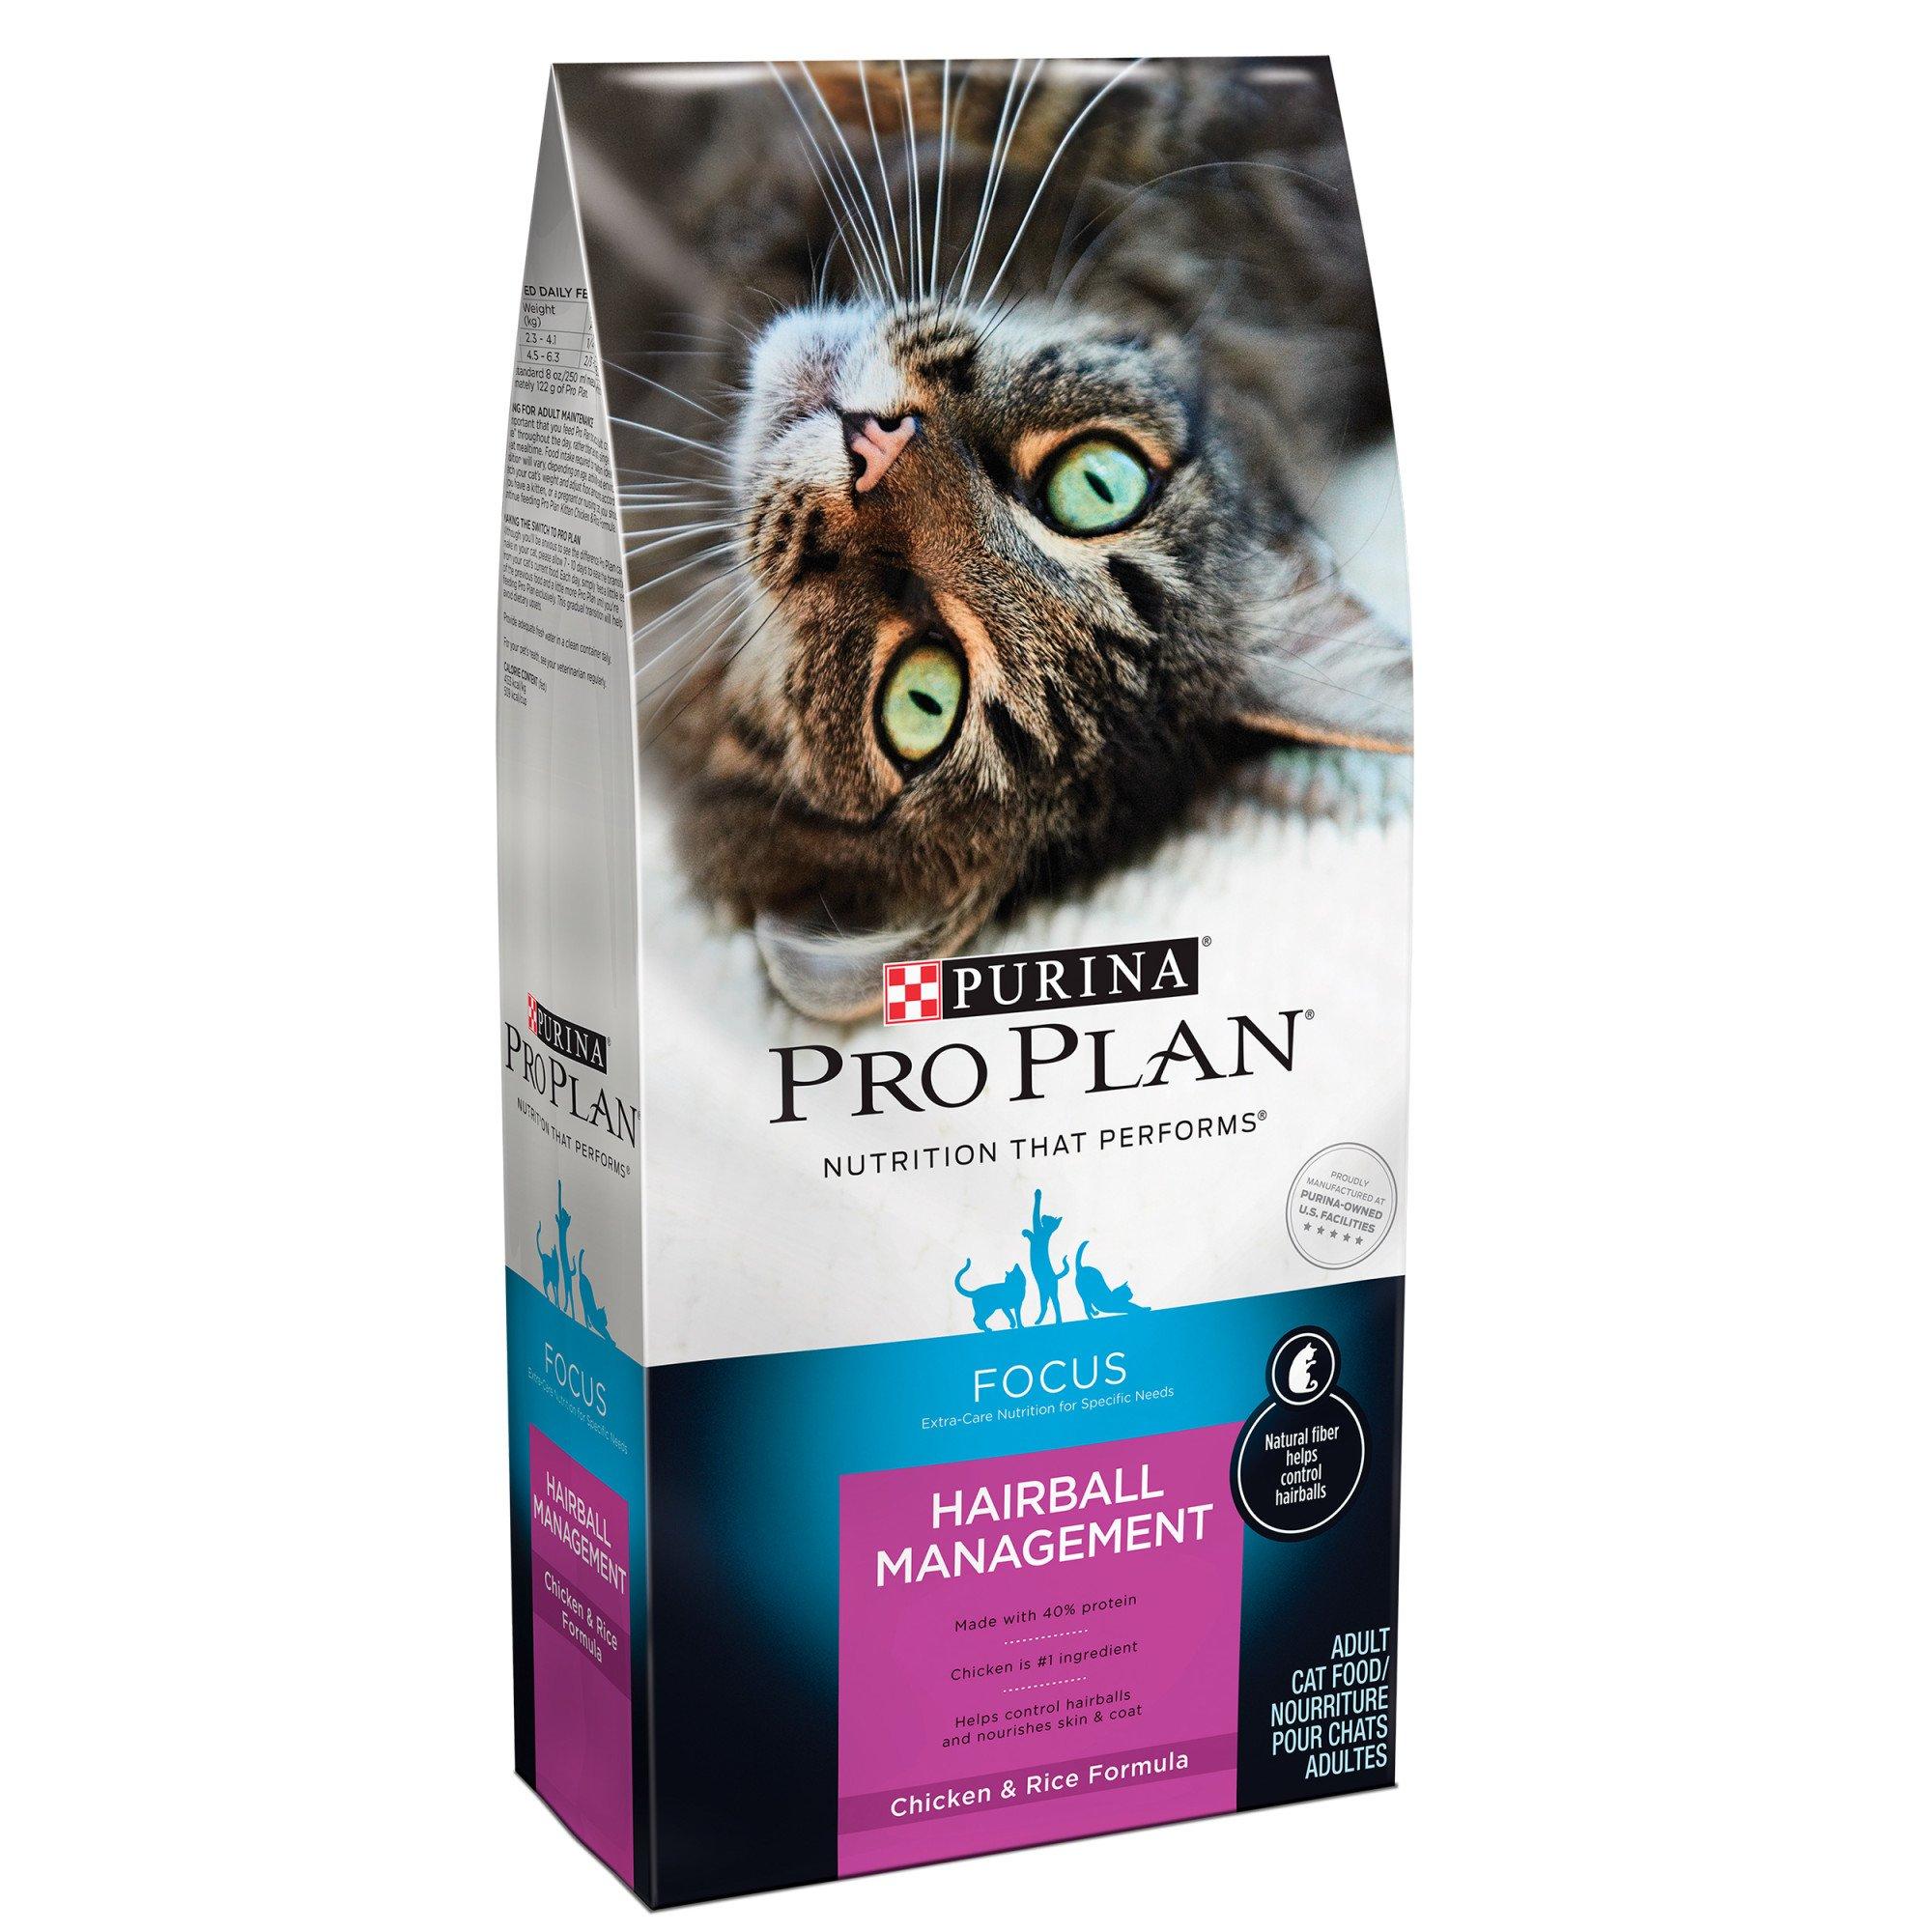 Pro Plan Focus Hairball Management Cat Food